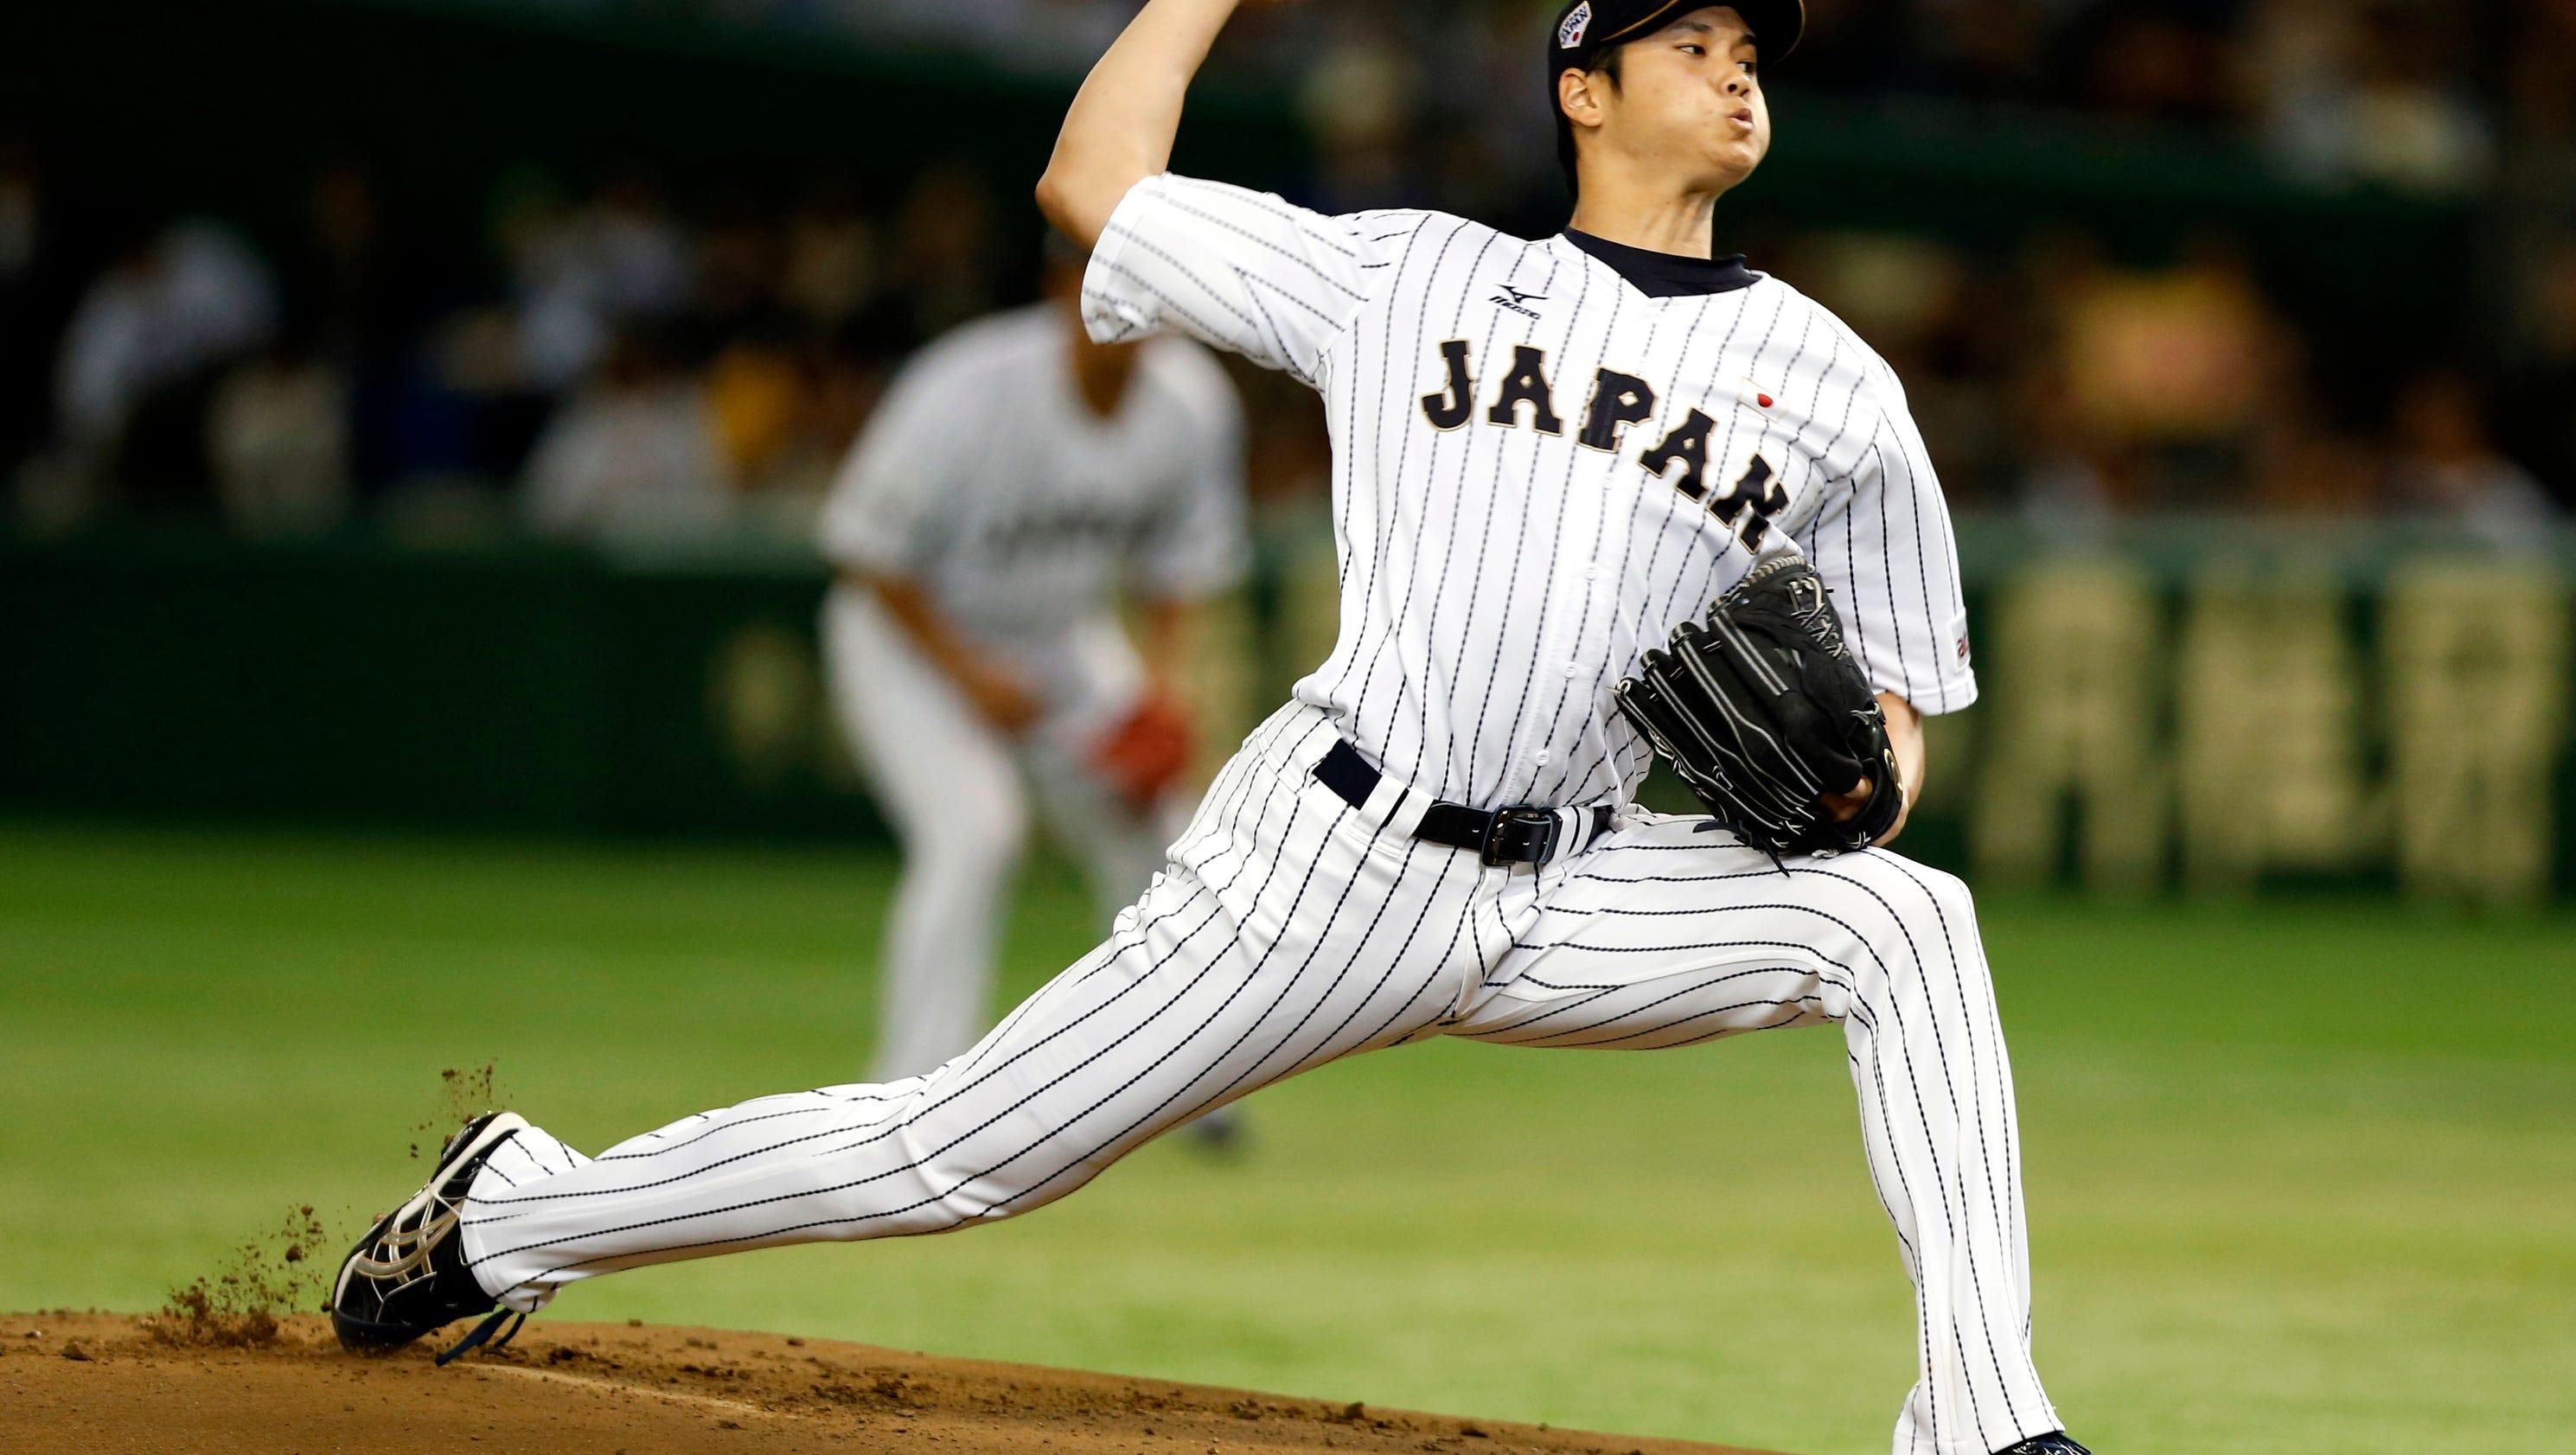 636479288813074775-ap-mlb-japan-ohtani-baseball